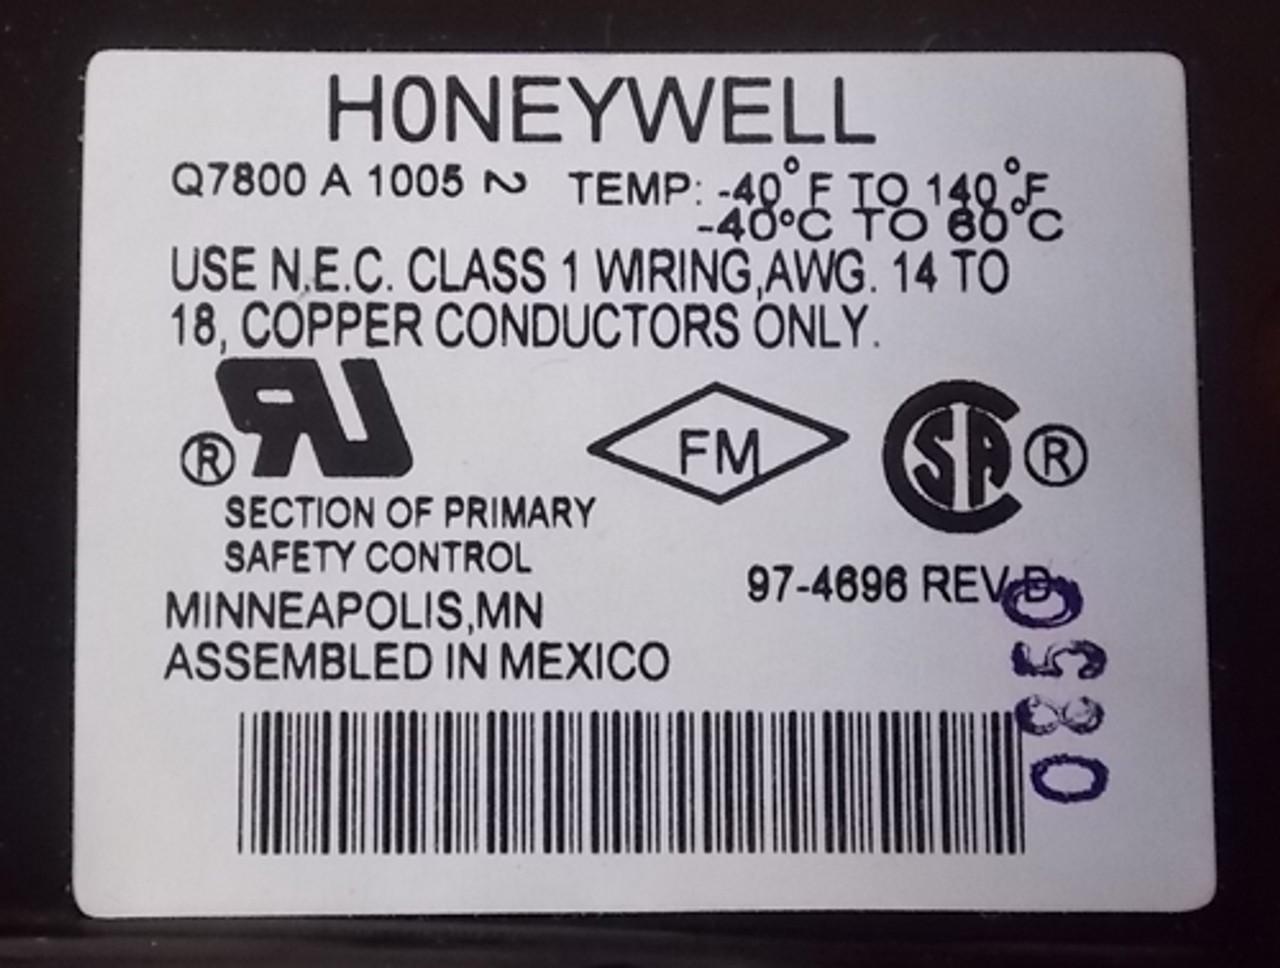 Honeywell Q7800A 1005 Universal Wiring Subbase Panel Mount - New